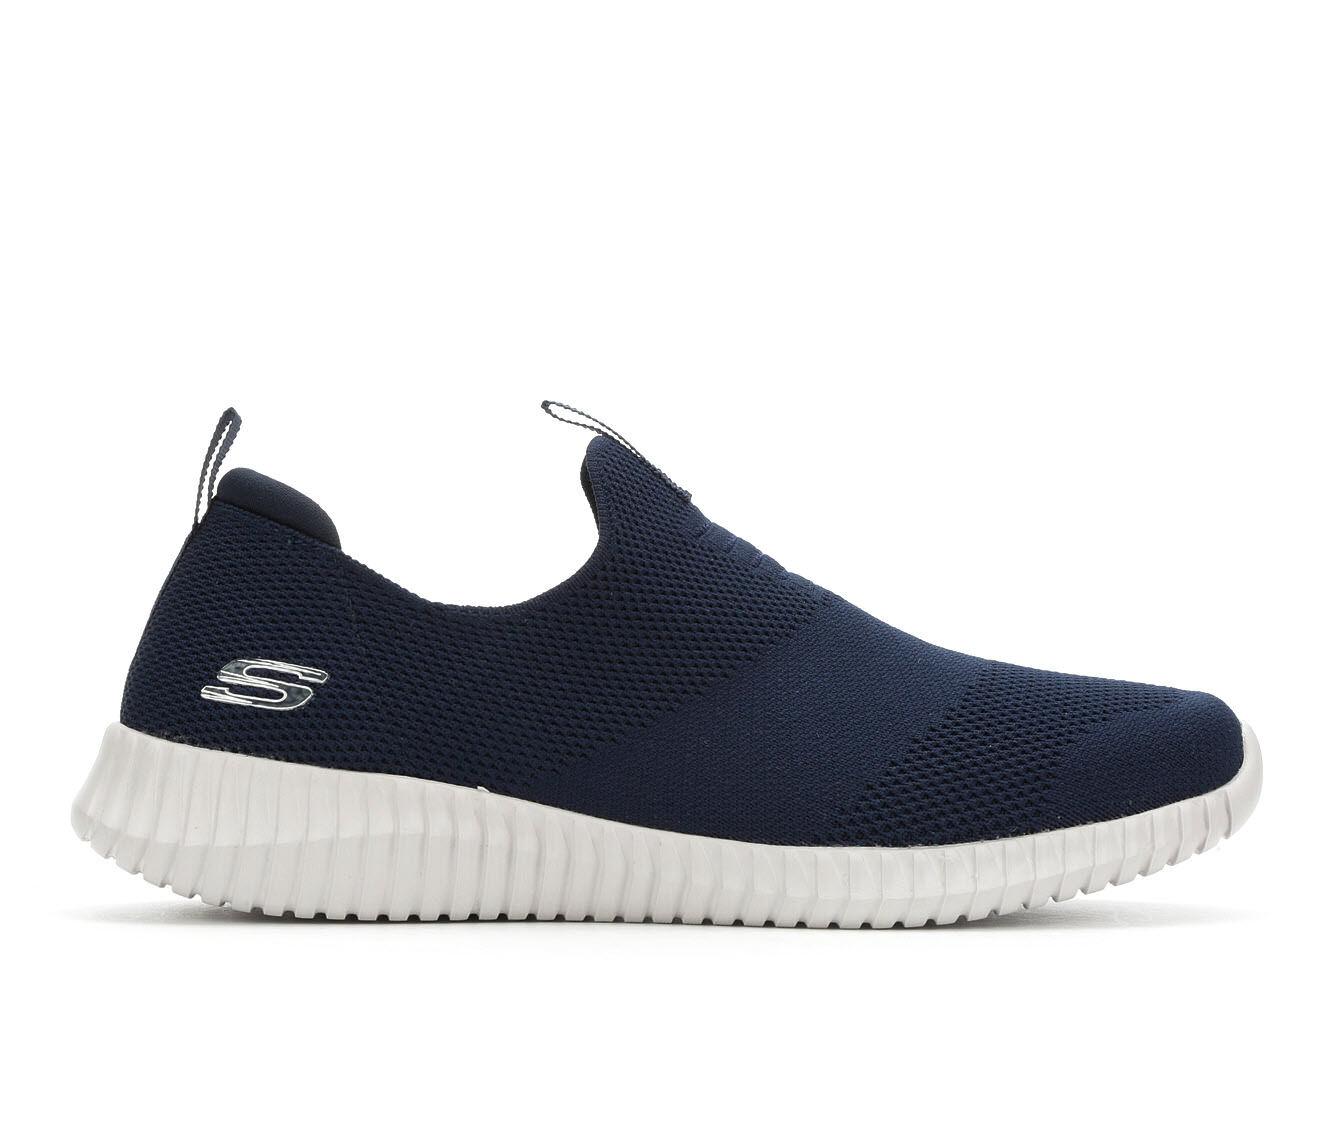 uk shoes_kd1774